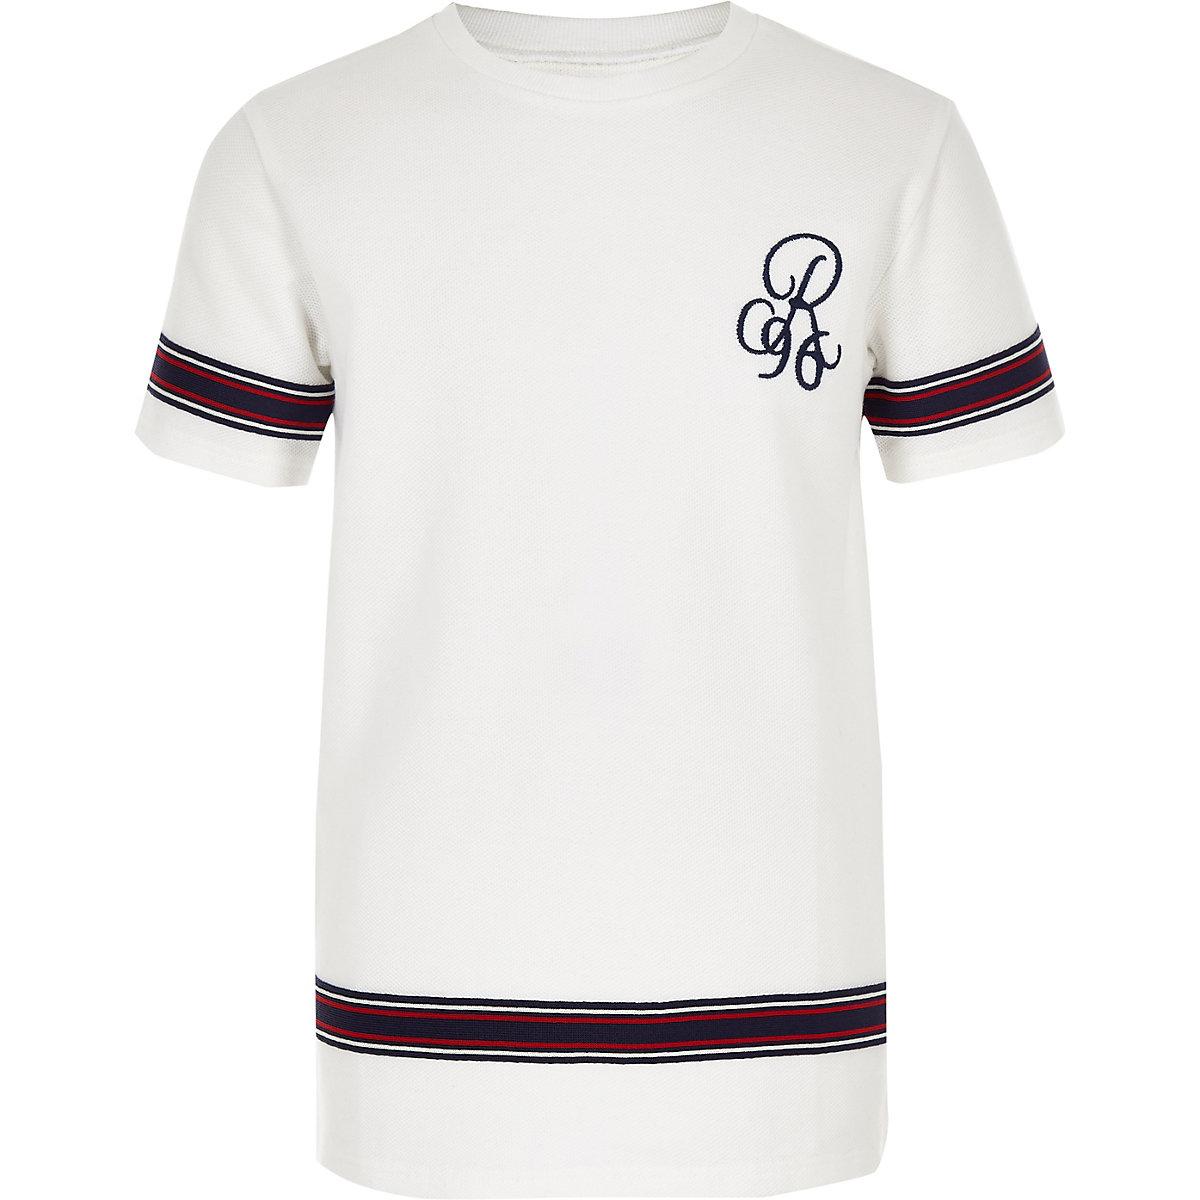 "Weißes T-Shirt ""R96"""